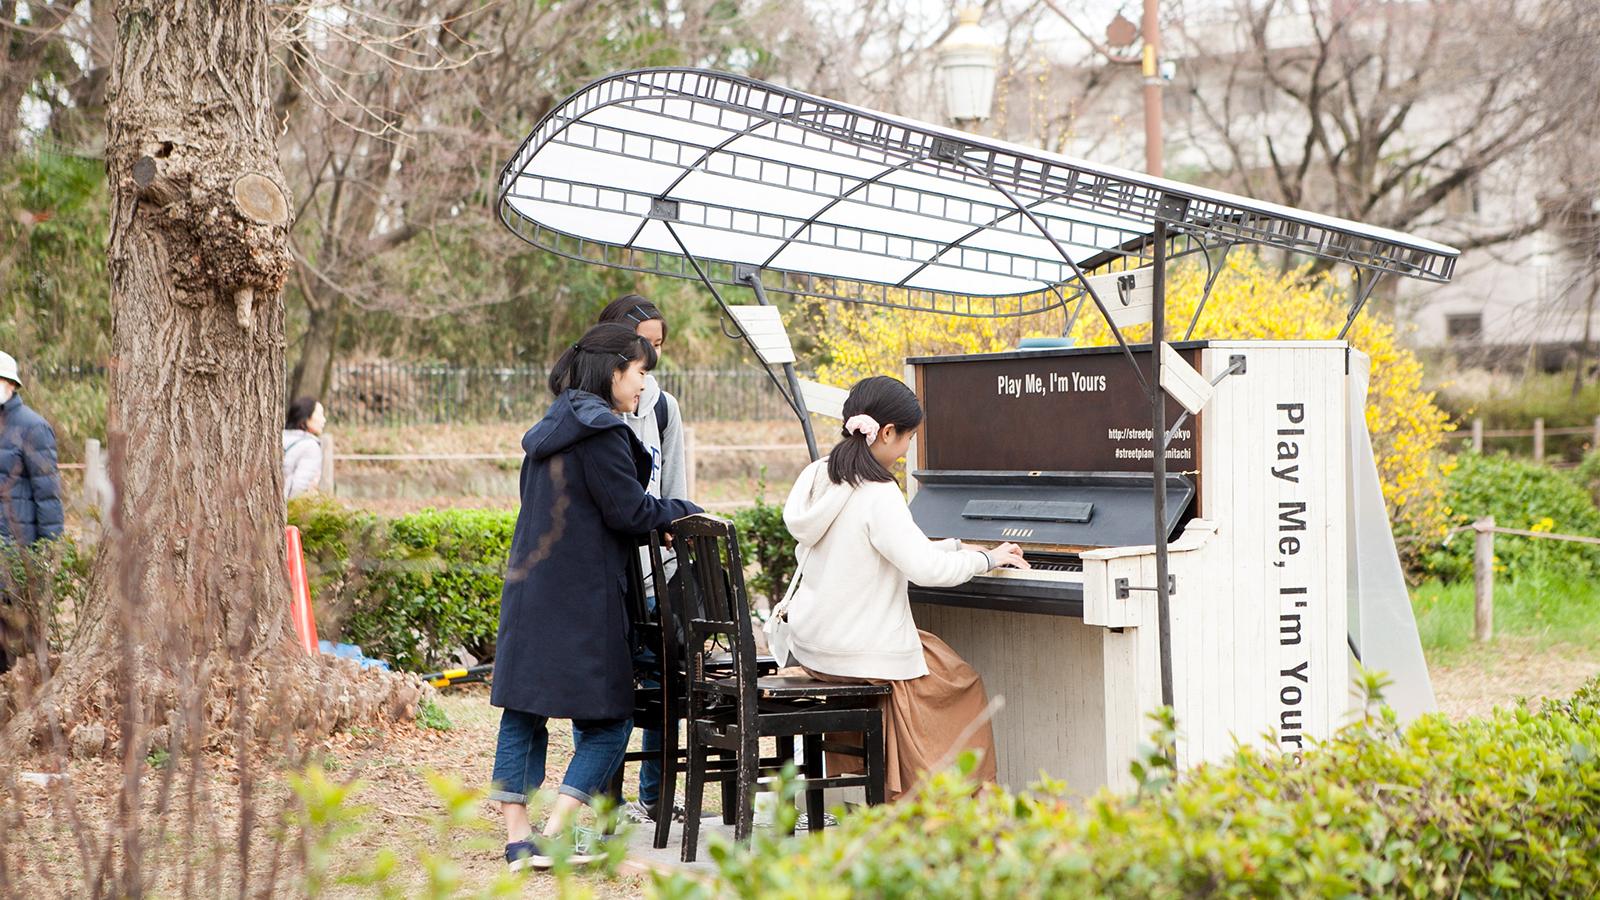 Play Me, I'm Yours Kunitachi 2018 | Kunitachi Arts and Sports Foundation